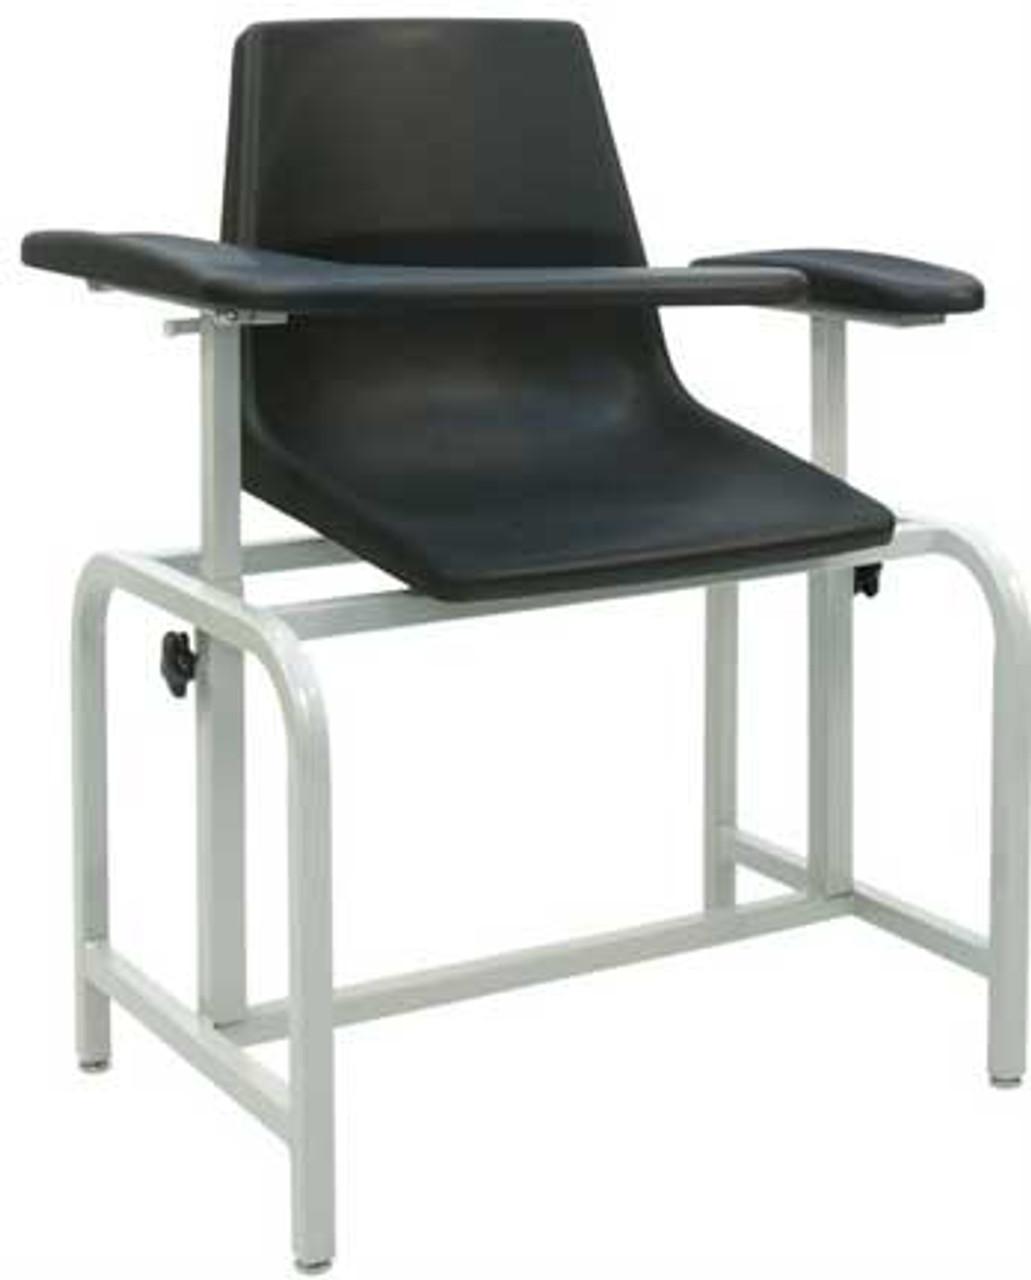 Fine Winco Blood Drawing Chair Phlebotomy Chair Plastic Seat Inzonedesignstudio Interior Chair Design Inzonedesignstudiocom